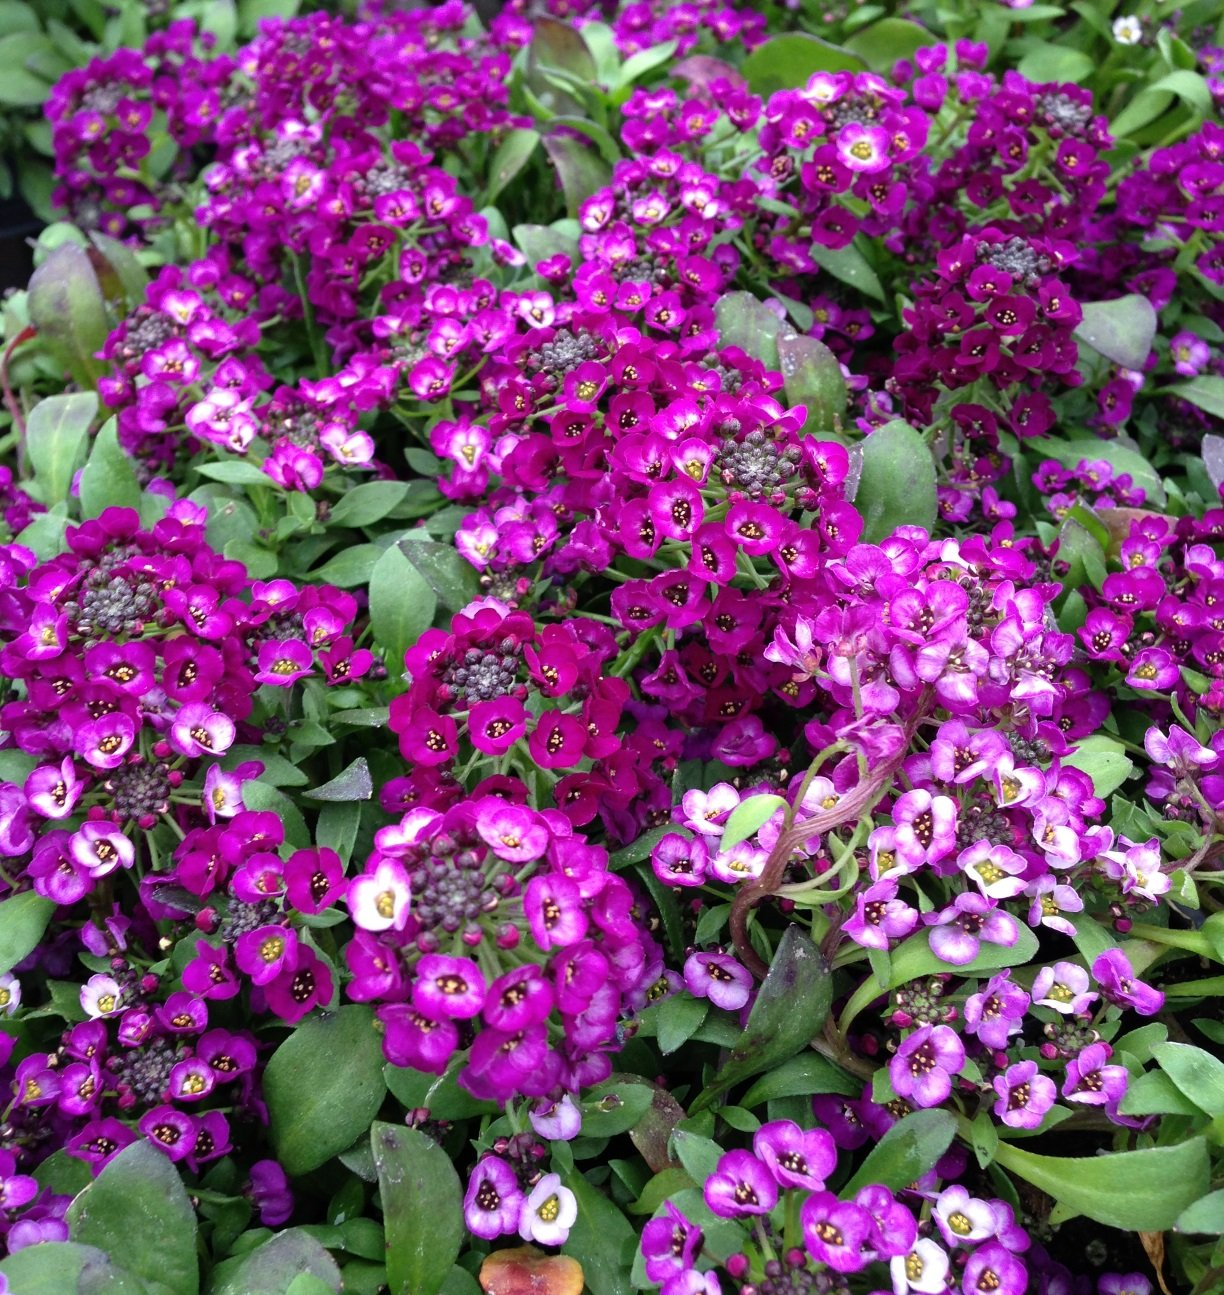 Alyssum 'Clear Crystal Purple' - 4 1/2